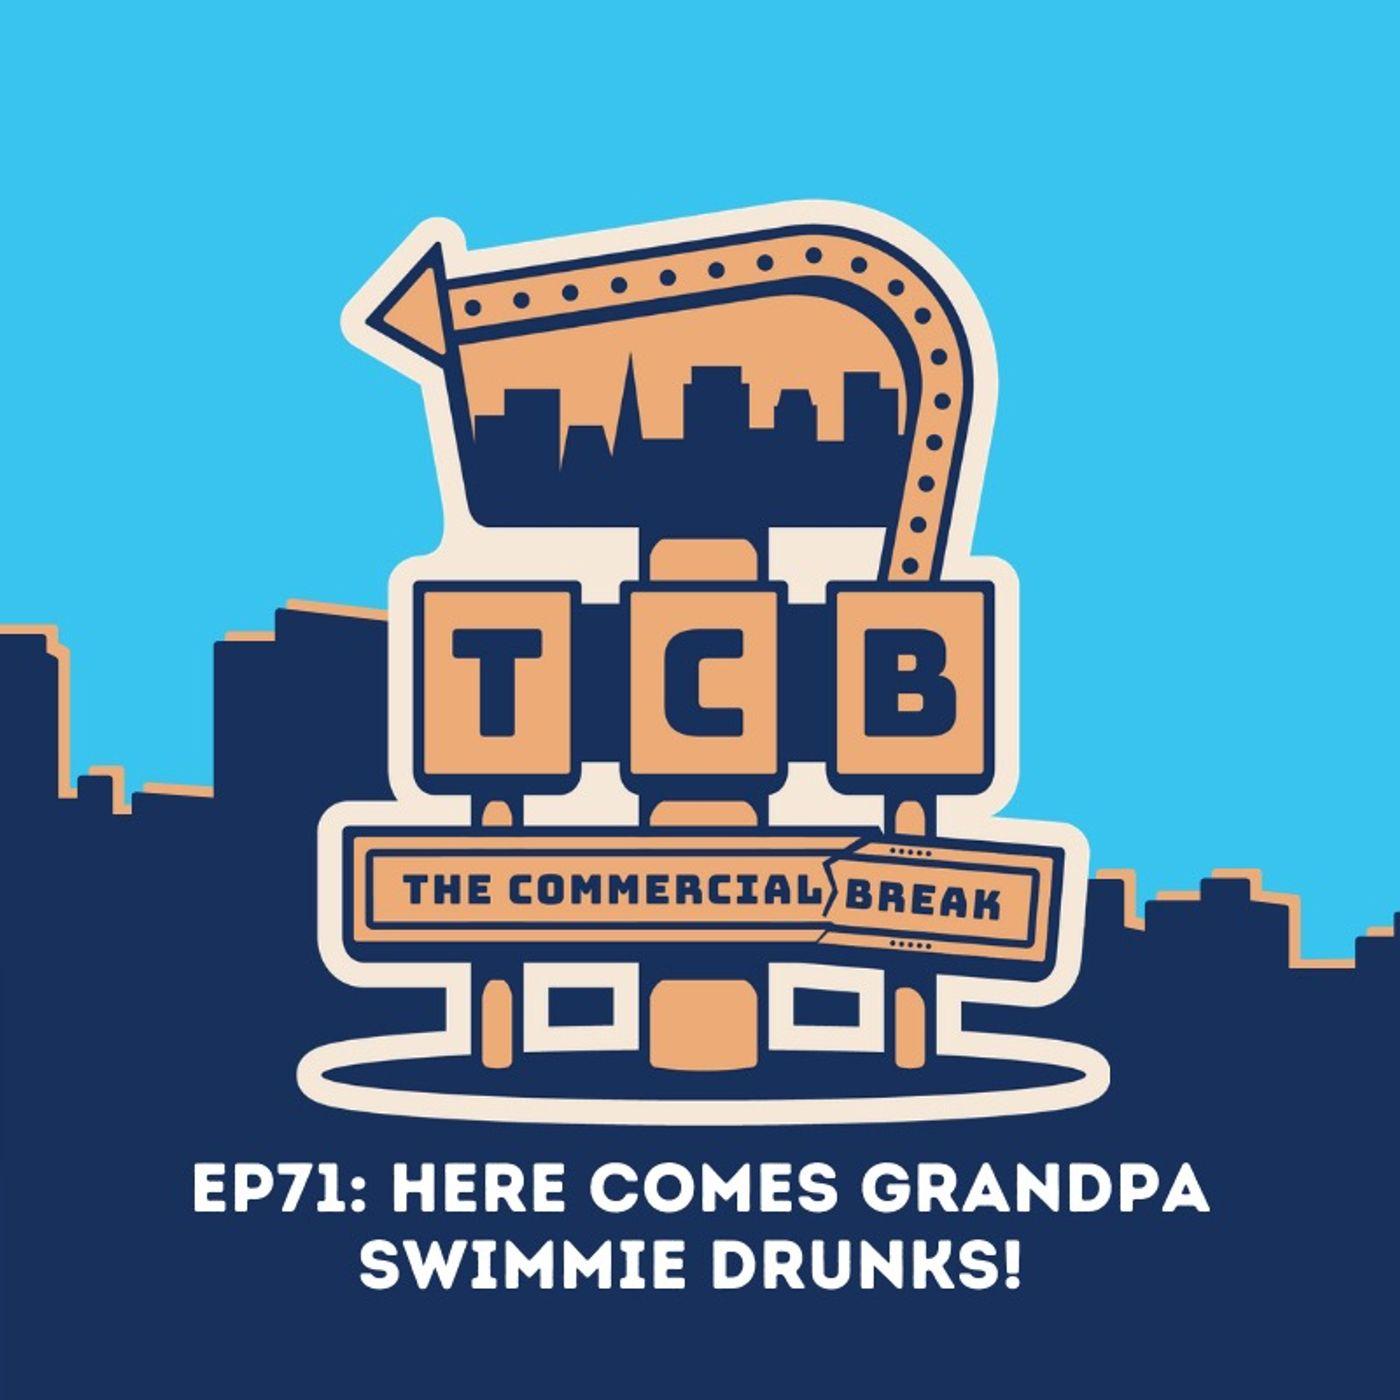 EP71: Here Comes Grandpa Swimmie Drunks!